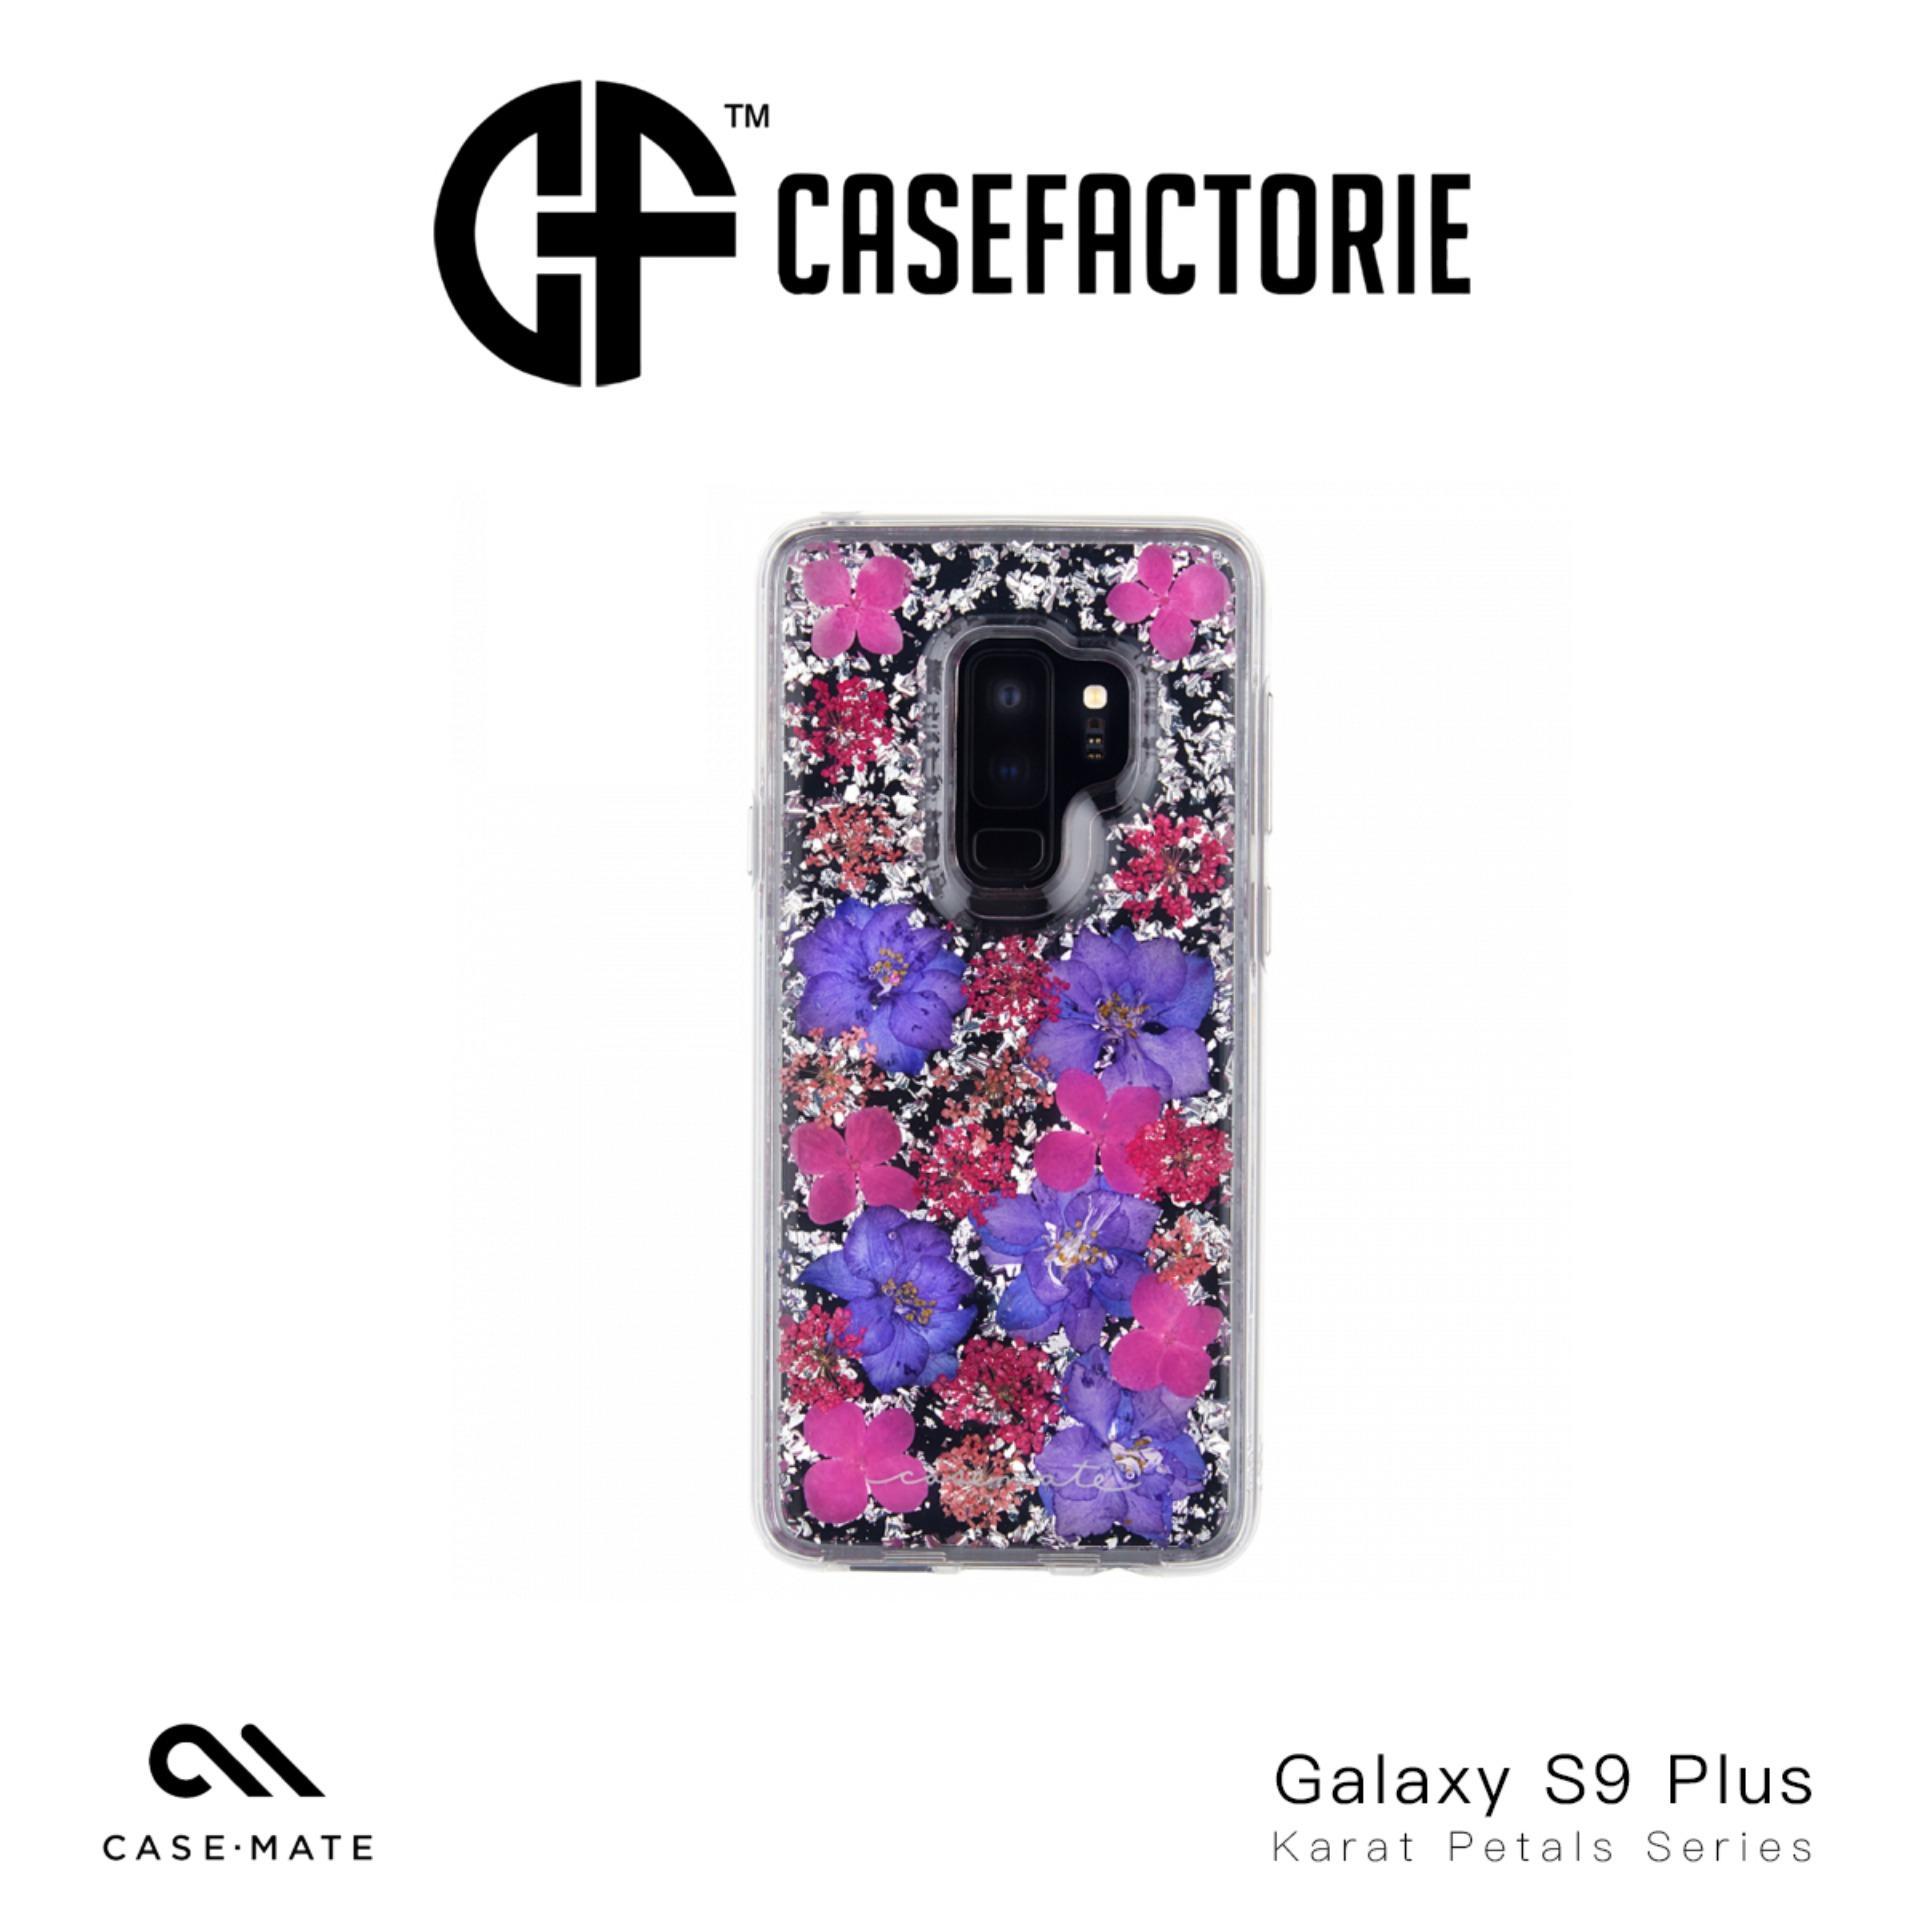 Case Mate Karat Petals Case For Samsung Galaxy S9 Plus Karat Petals Singapore